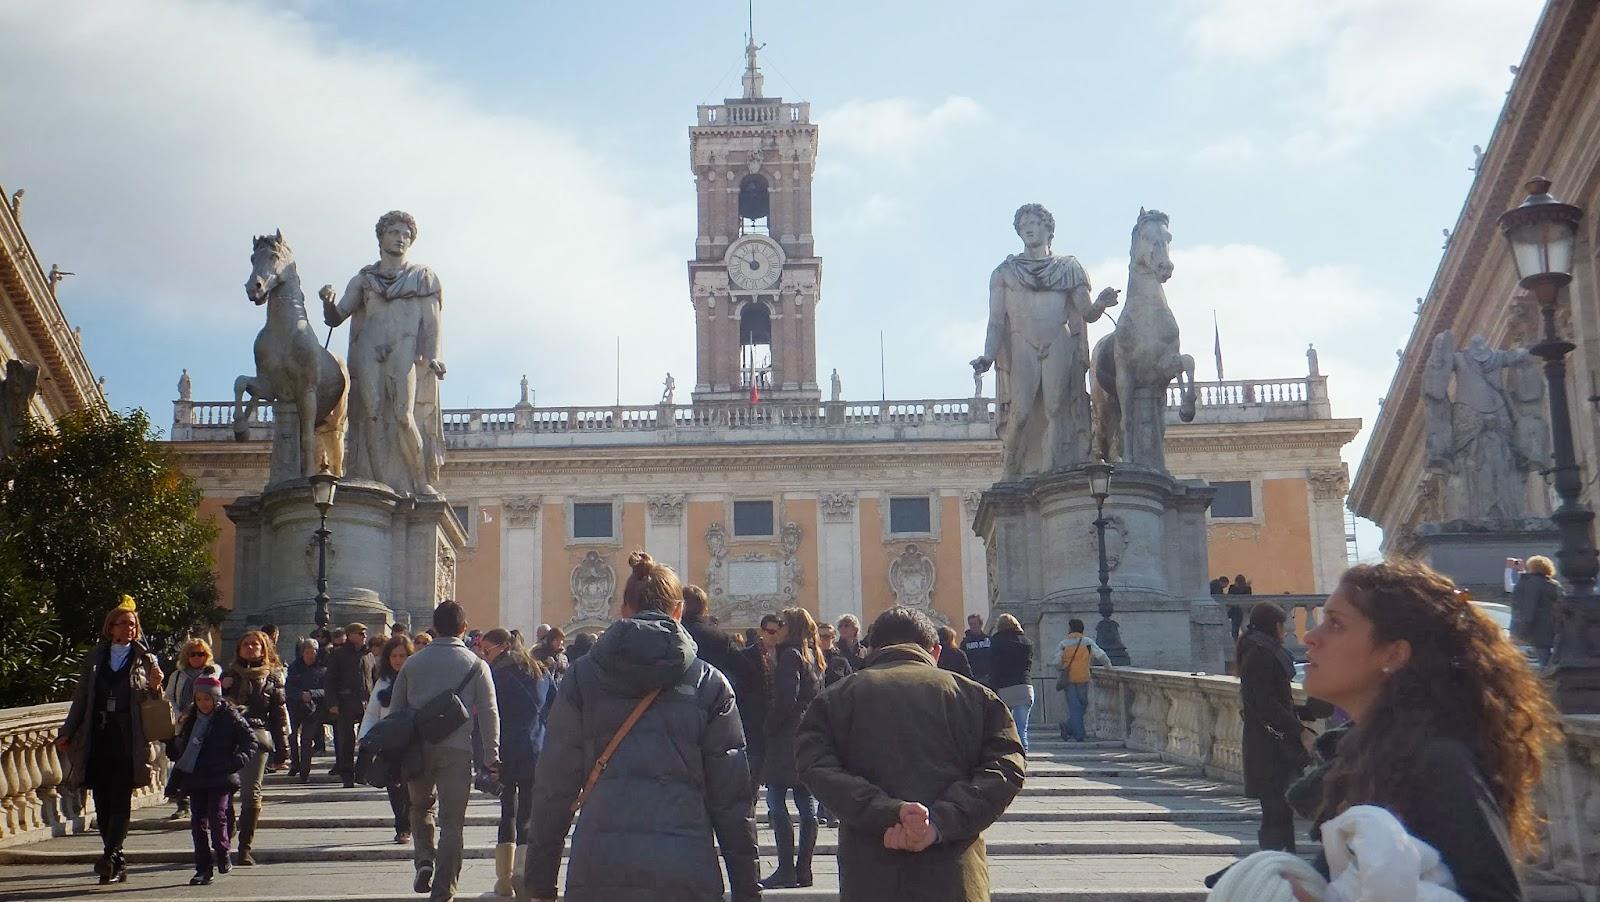 Piazza di Campidoglio, Roma, Italia, Elisa N, Blog de Viajes, Lifestyle, Travel